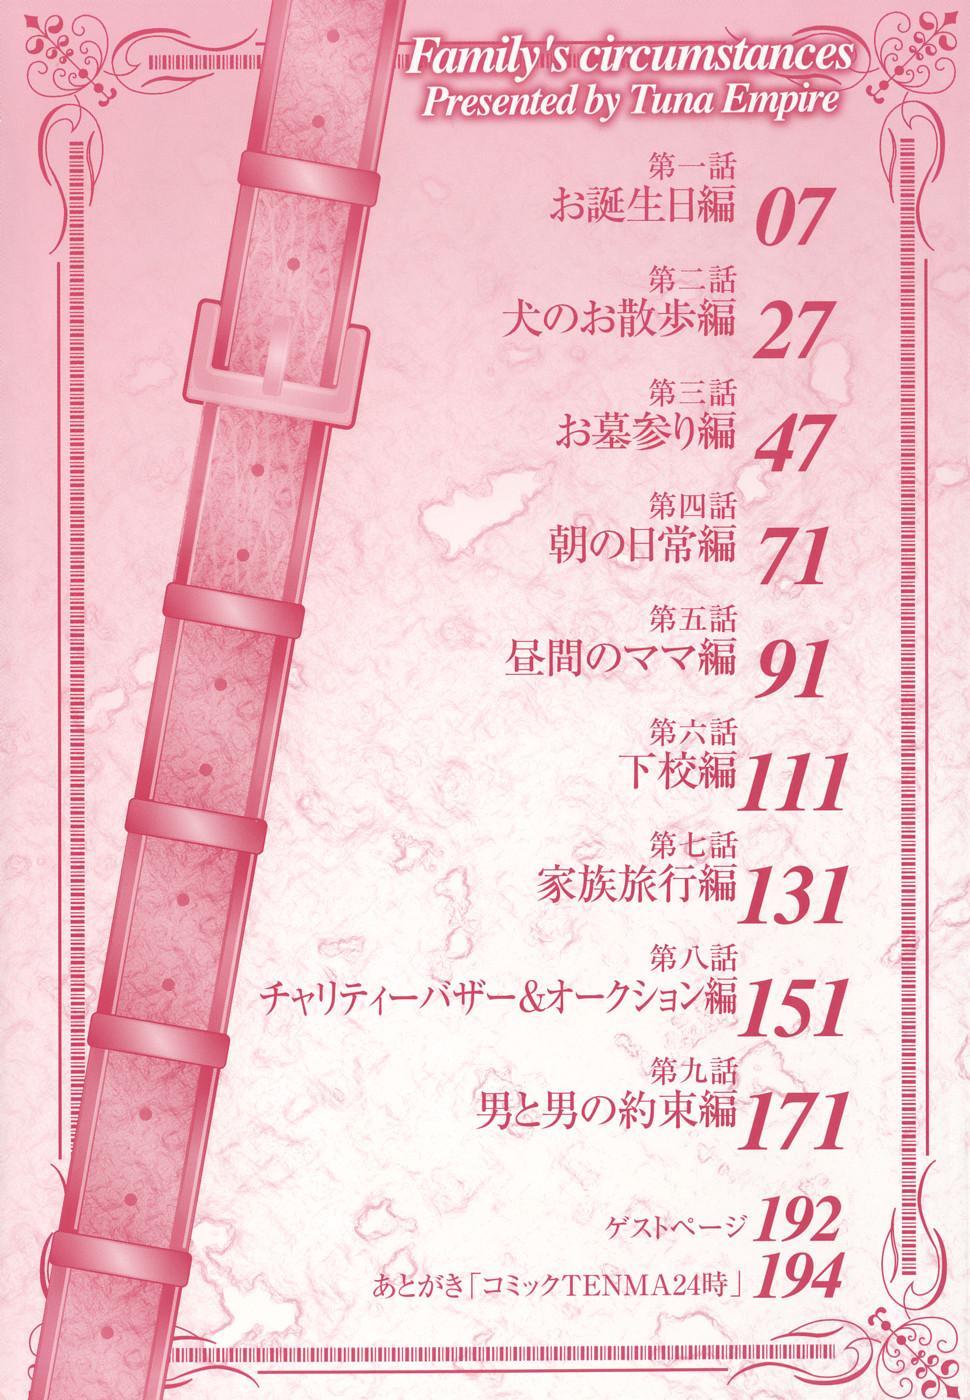 Katei no Jijou - Family's circumstances 5